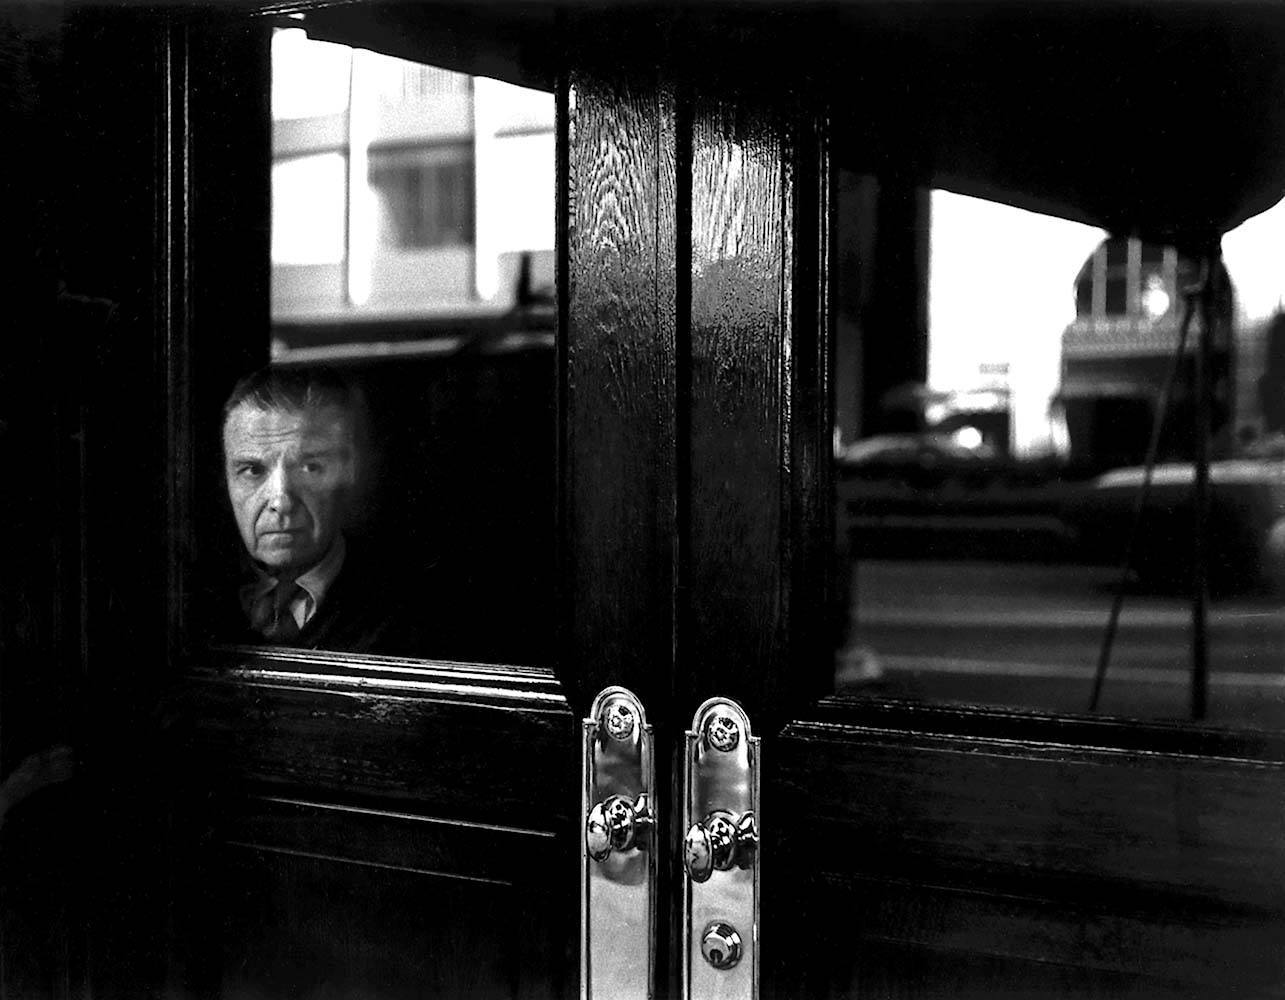 "<span class=""caption-title"">Doorman</span>, Park Avenue, New York City, New York, 1971<span class=""caption-copyright"">© Rodney Smith</span>"